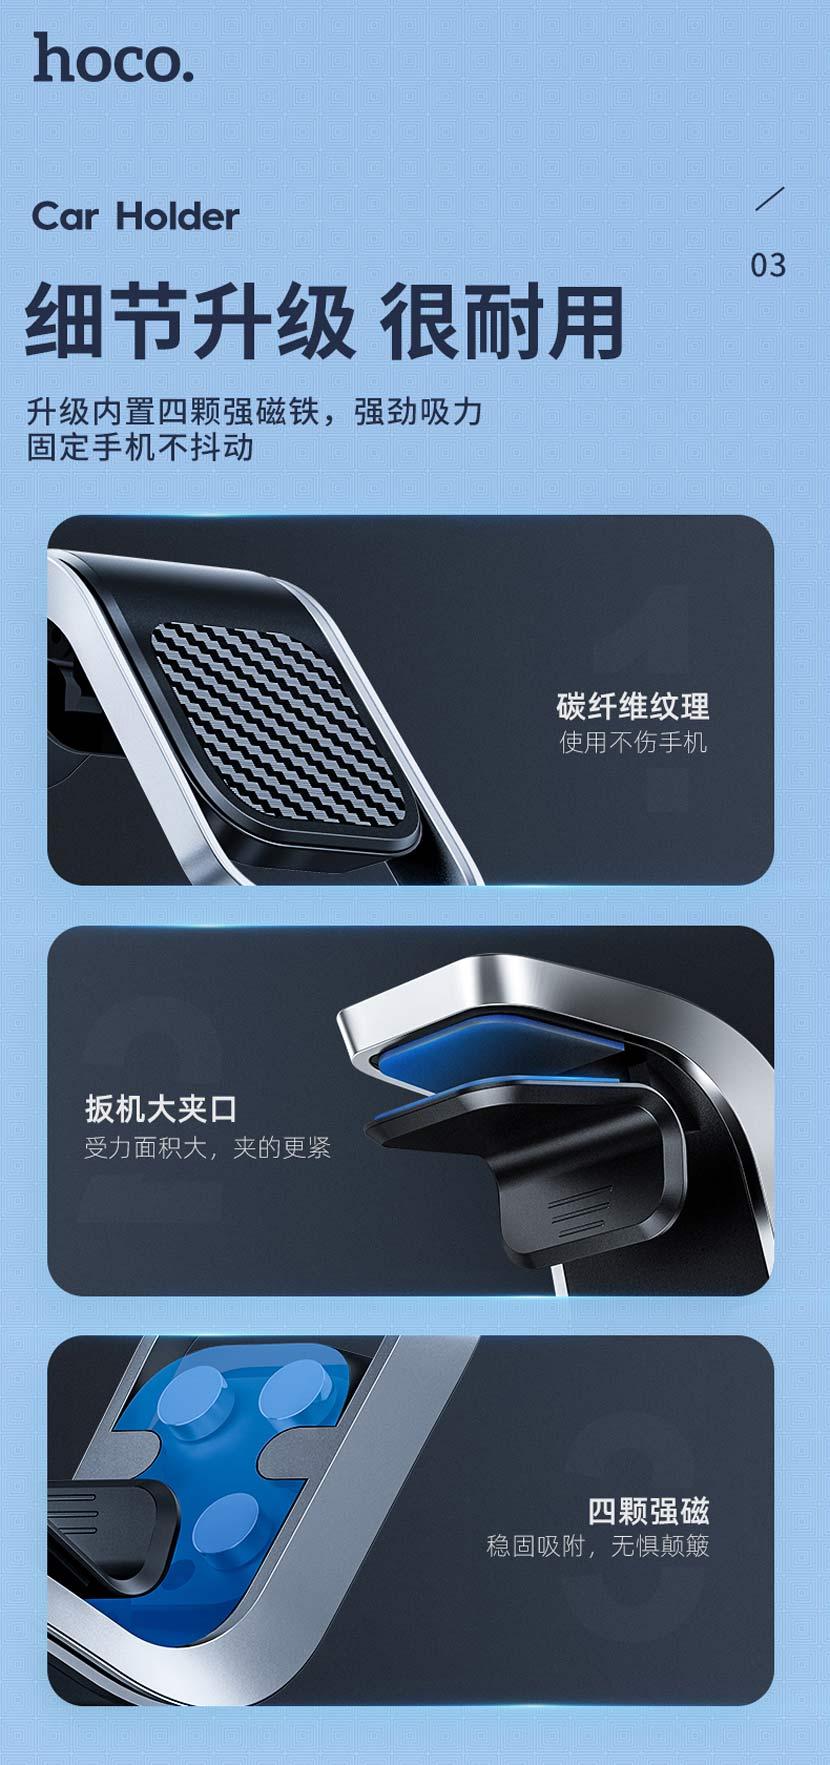 hoco news ca74 universe air outlet magnetic car holder details cn